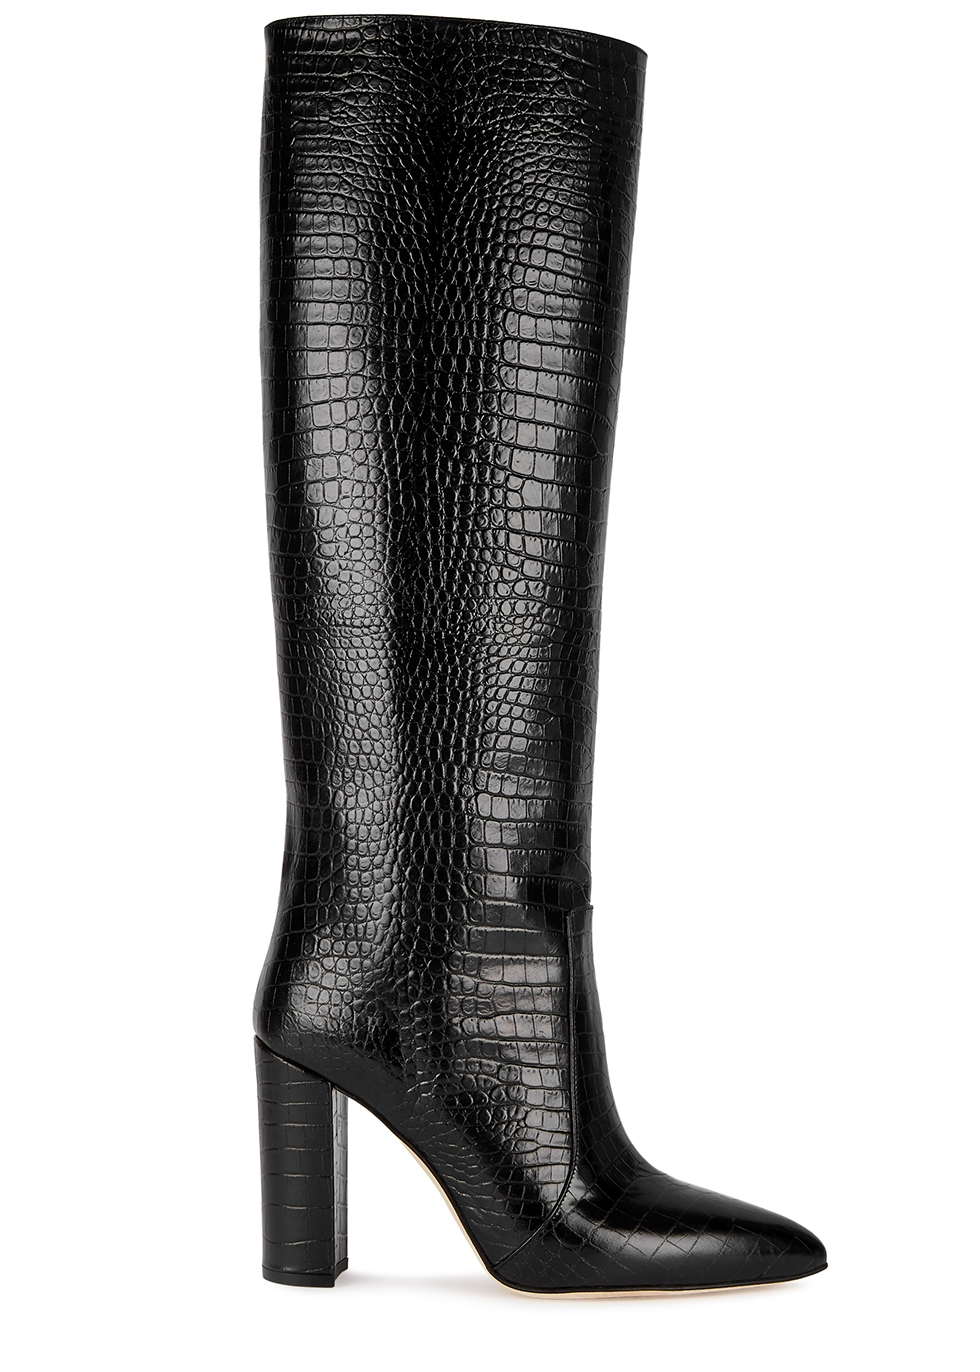 Women's Designer Knee-High Boots